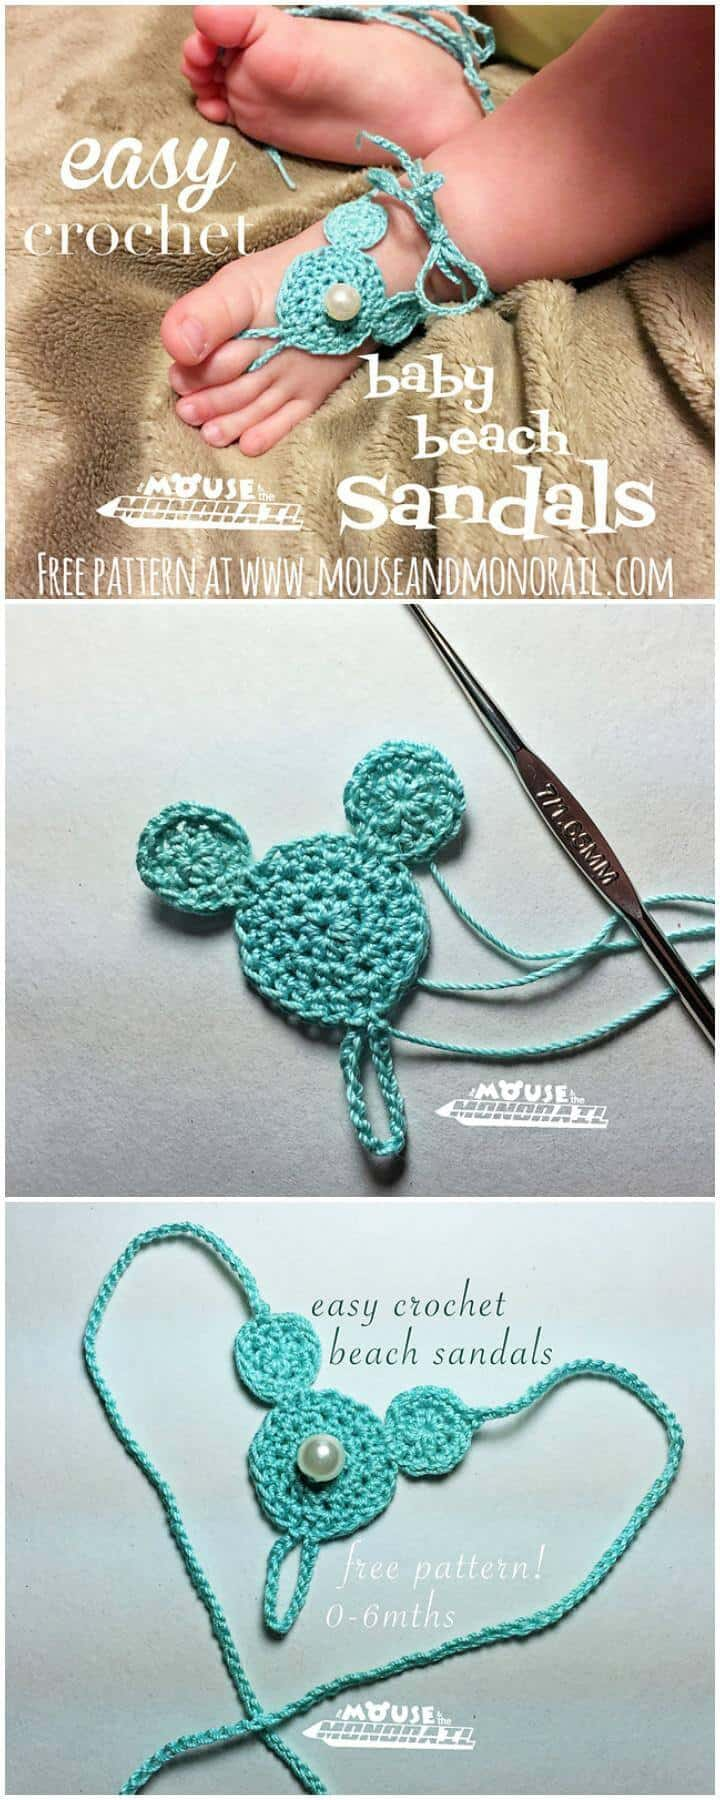 Easy Crochet Baby Beach Barefoot Sandals